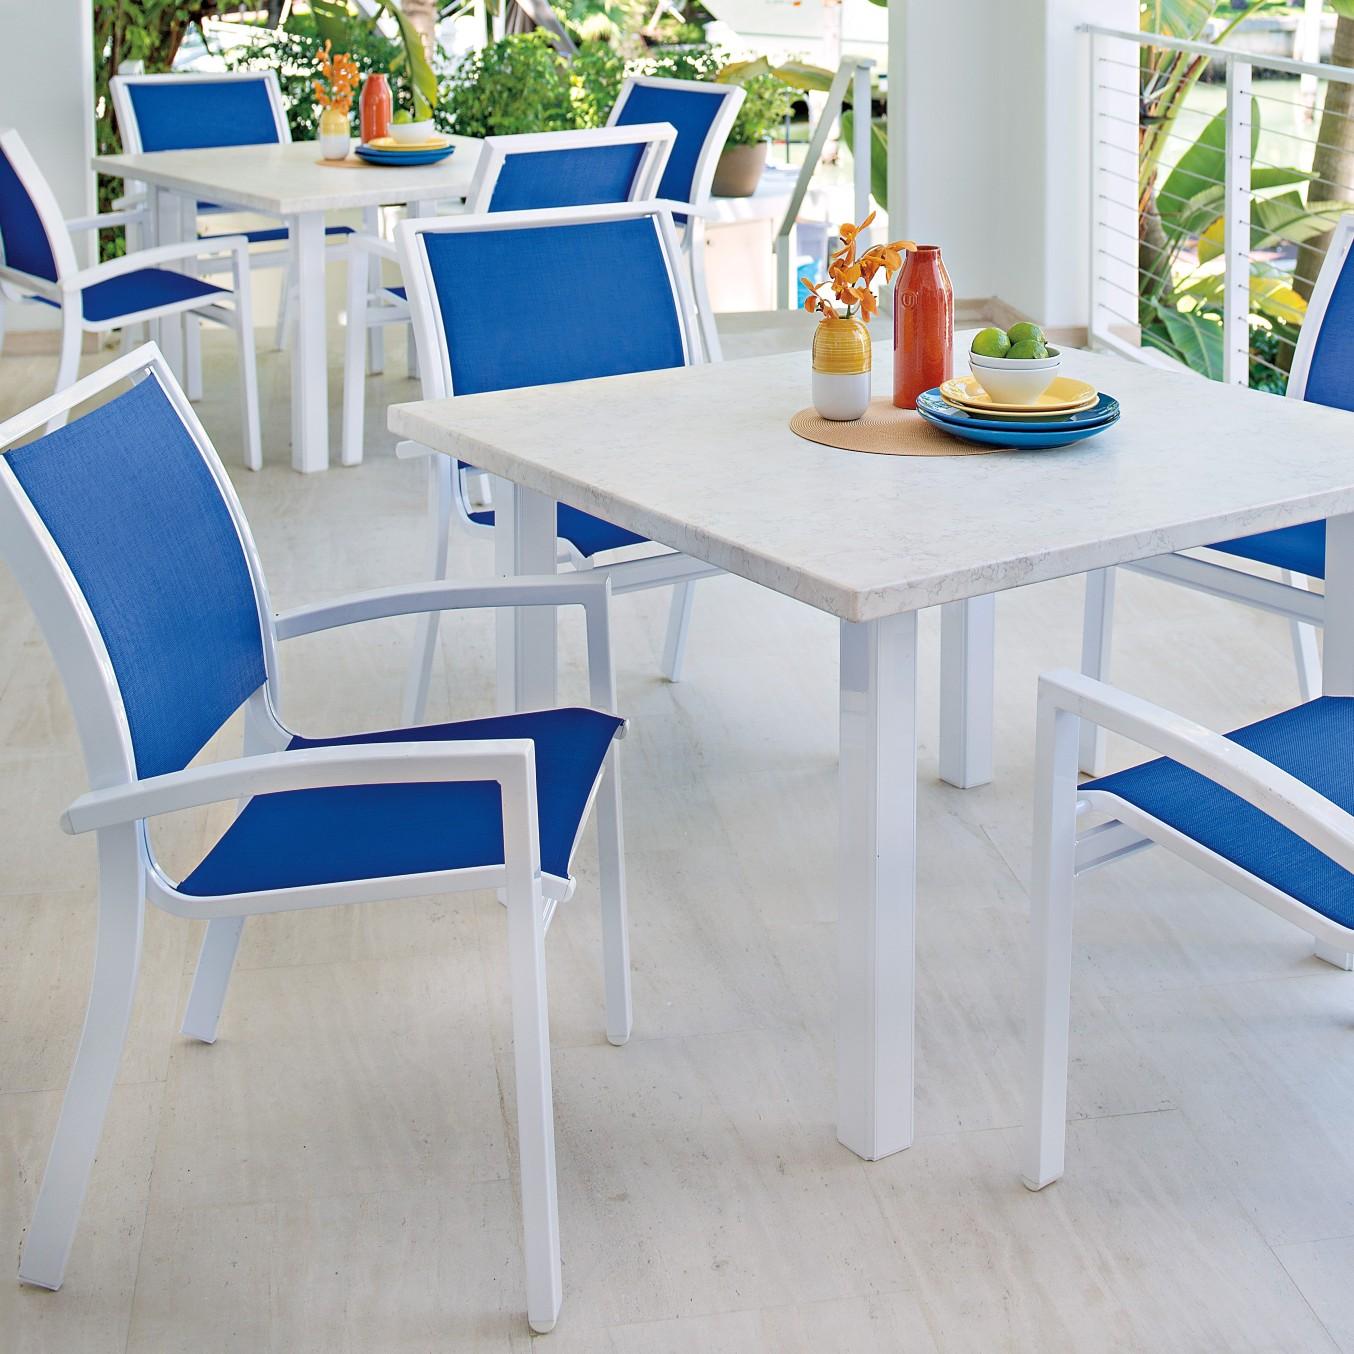 kendall-sling-dining-chairs-pixlr-1.jpg